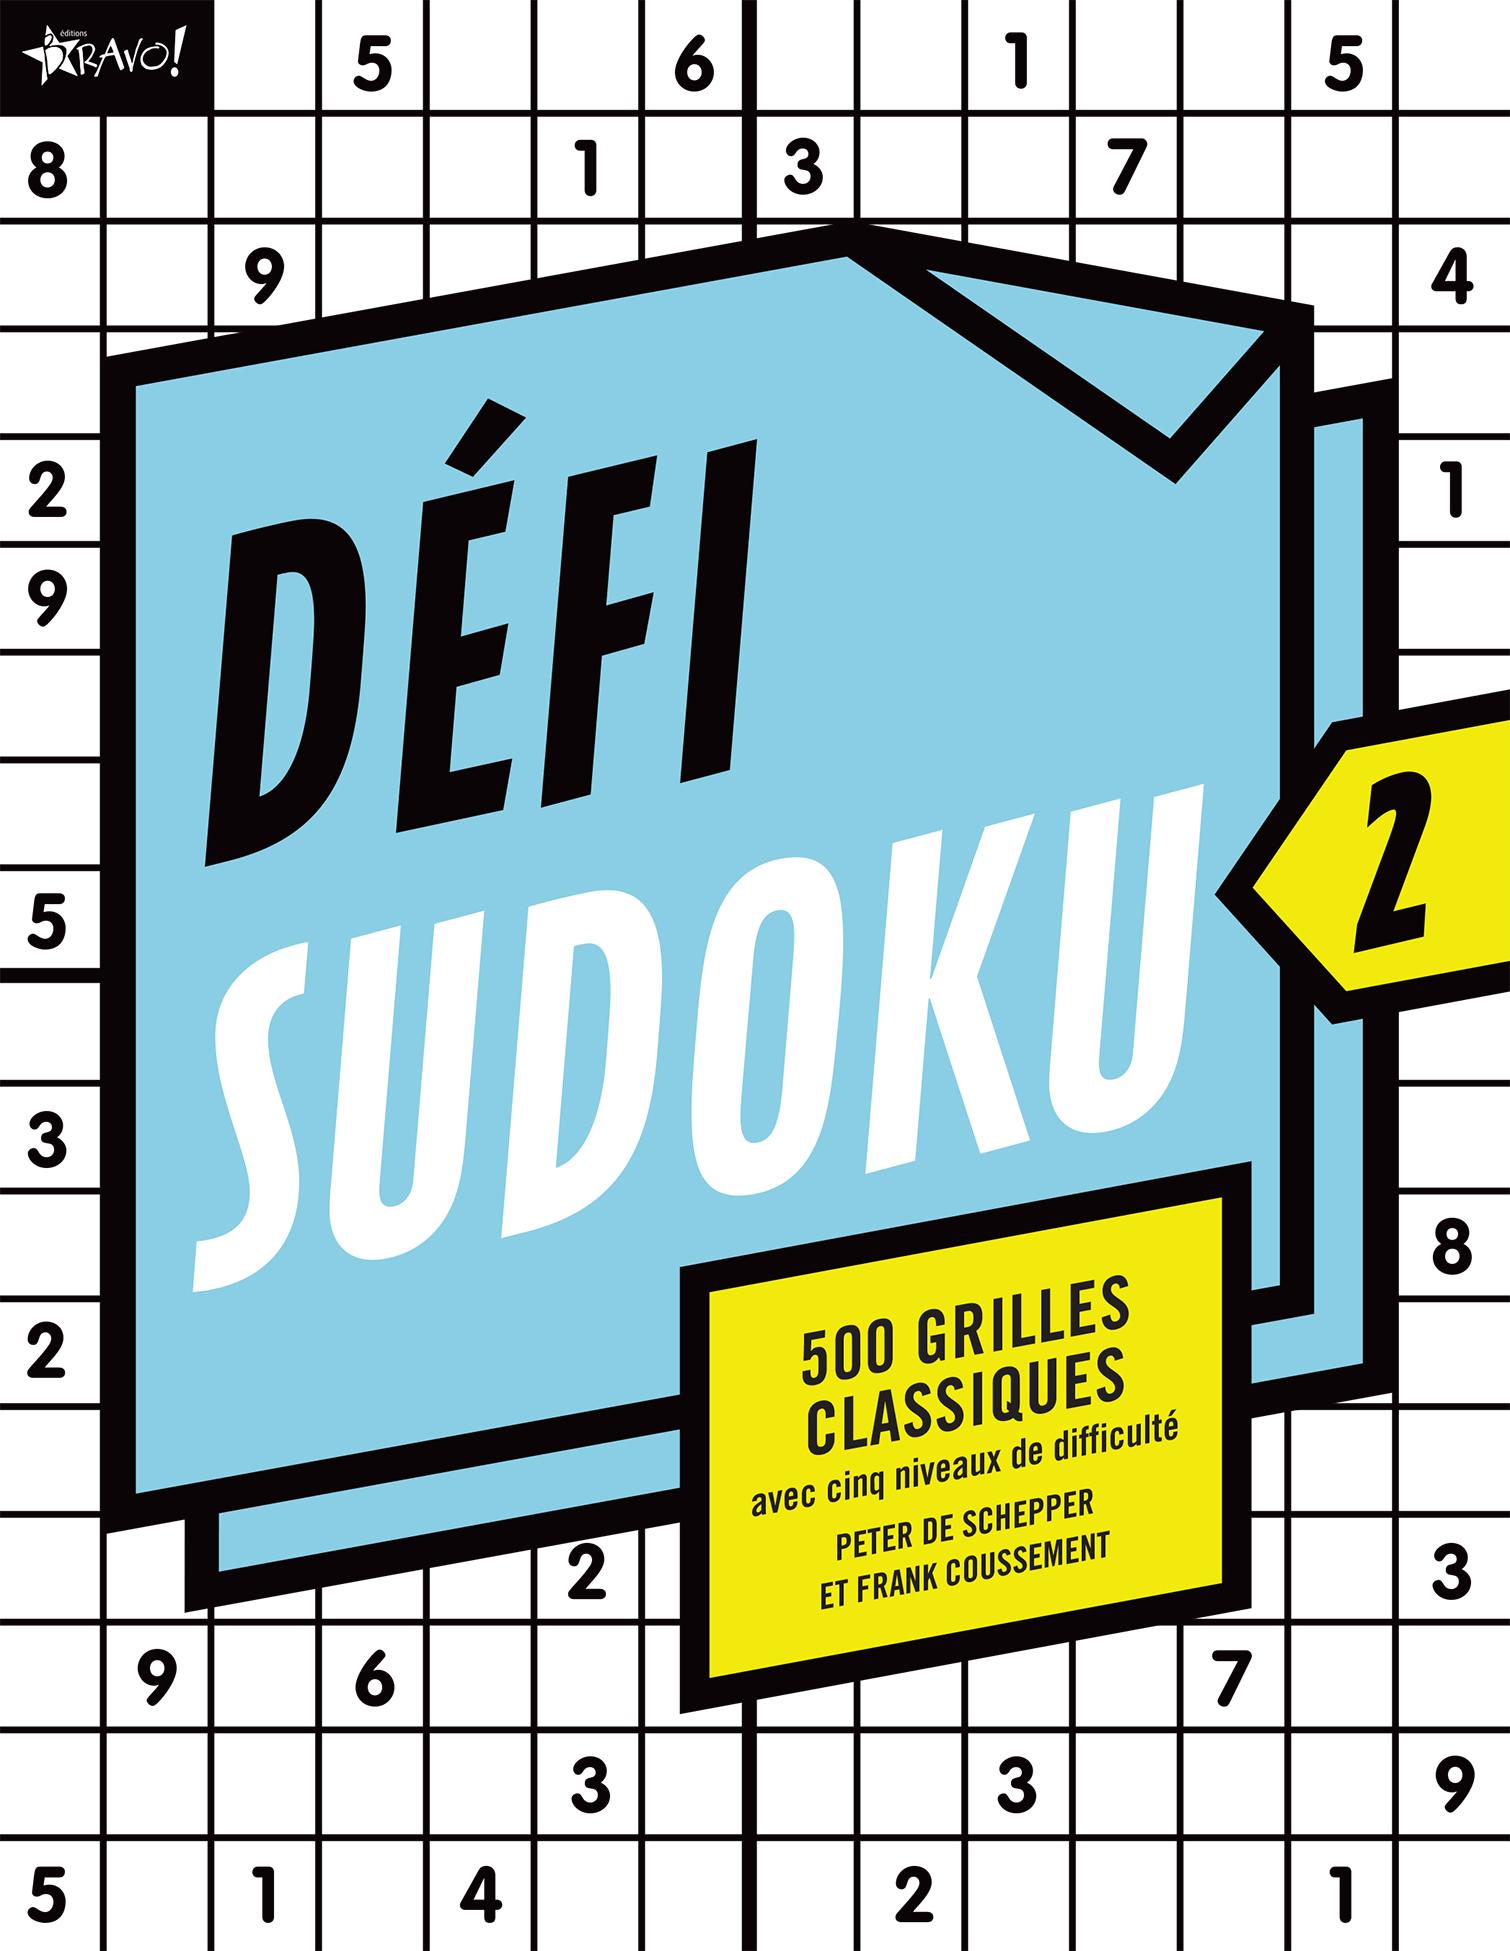 319_DefiSudoku2_C1